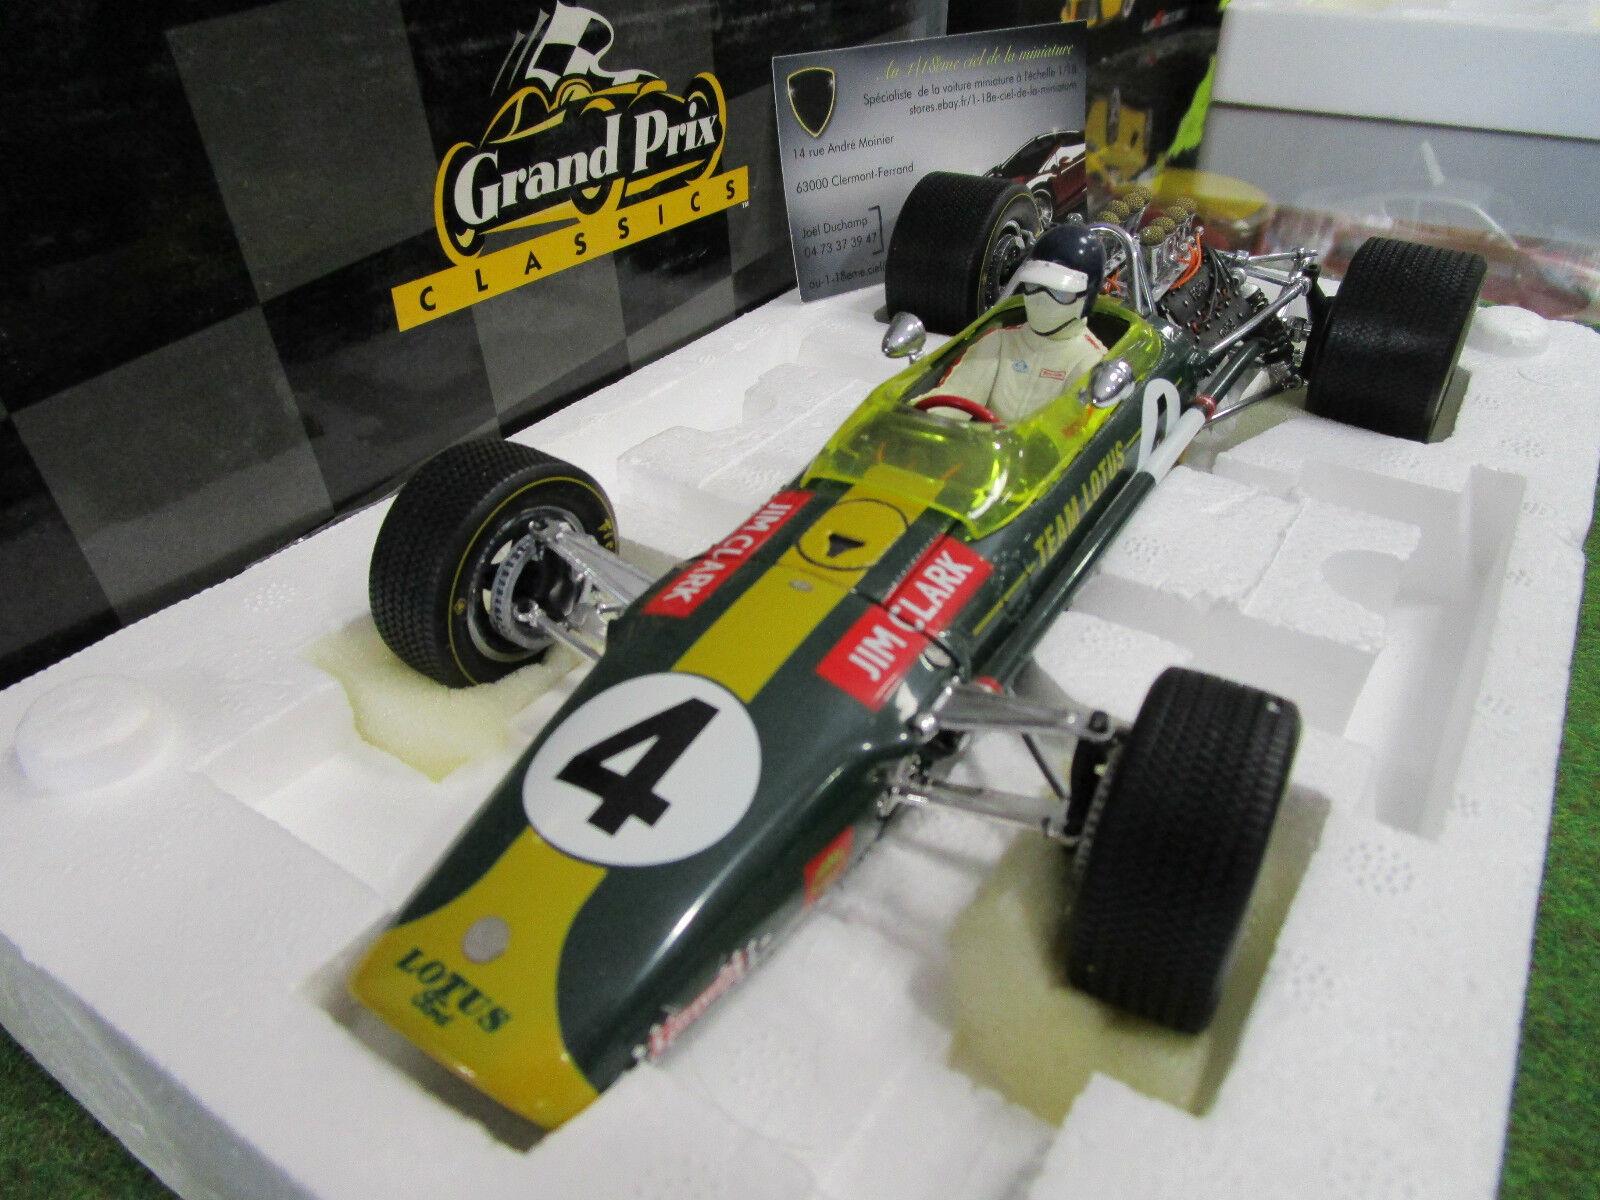 F1 LOTUS TYPE 49 Grand prix Afrique du Sud 1968 CLARK 1 18 EXOTO 97002 formule 1